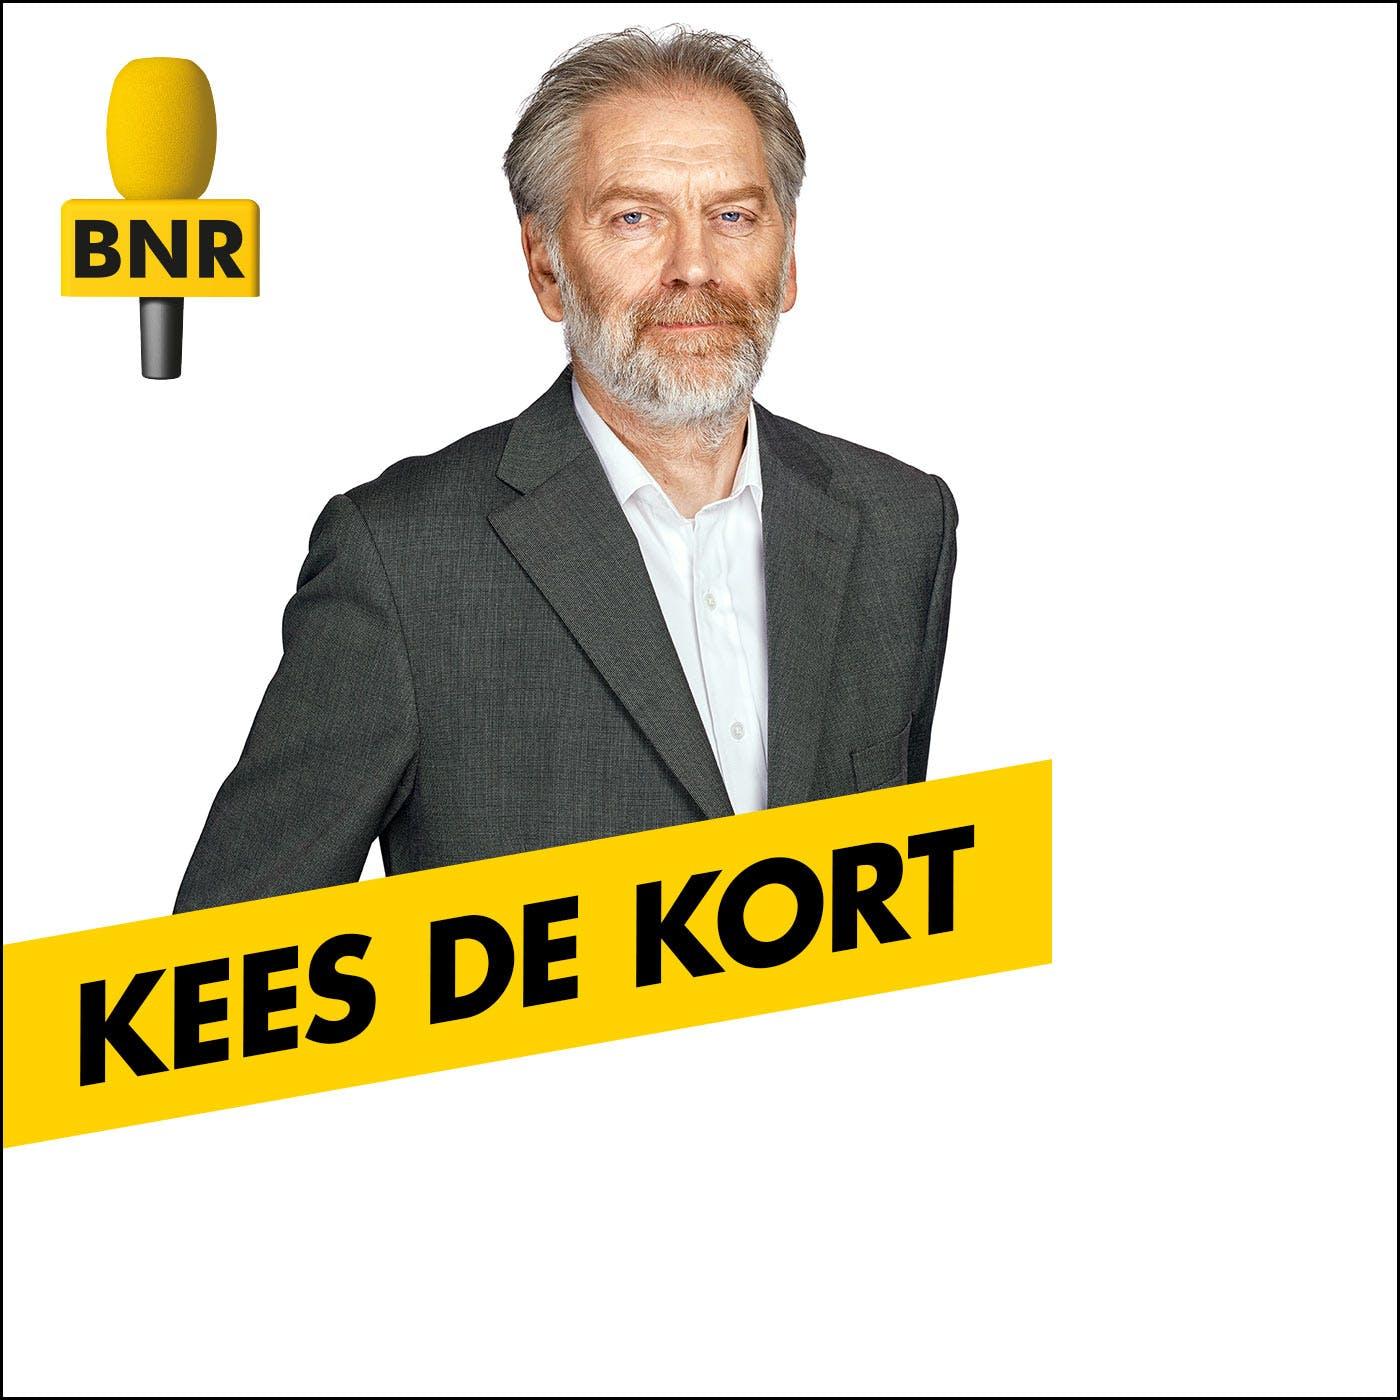 Kees de Kort | BNR logo